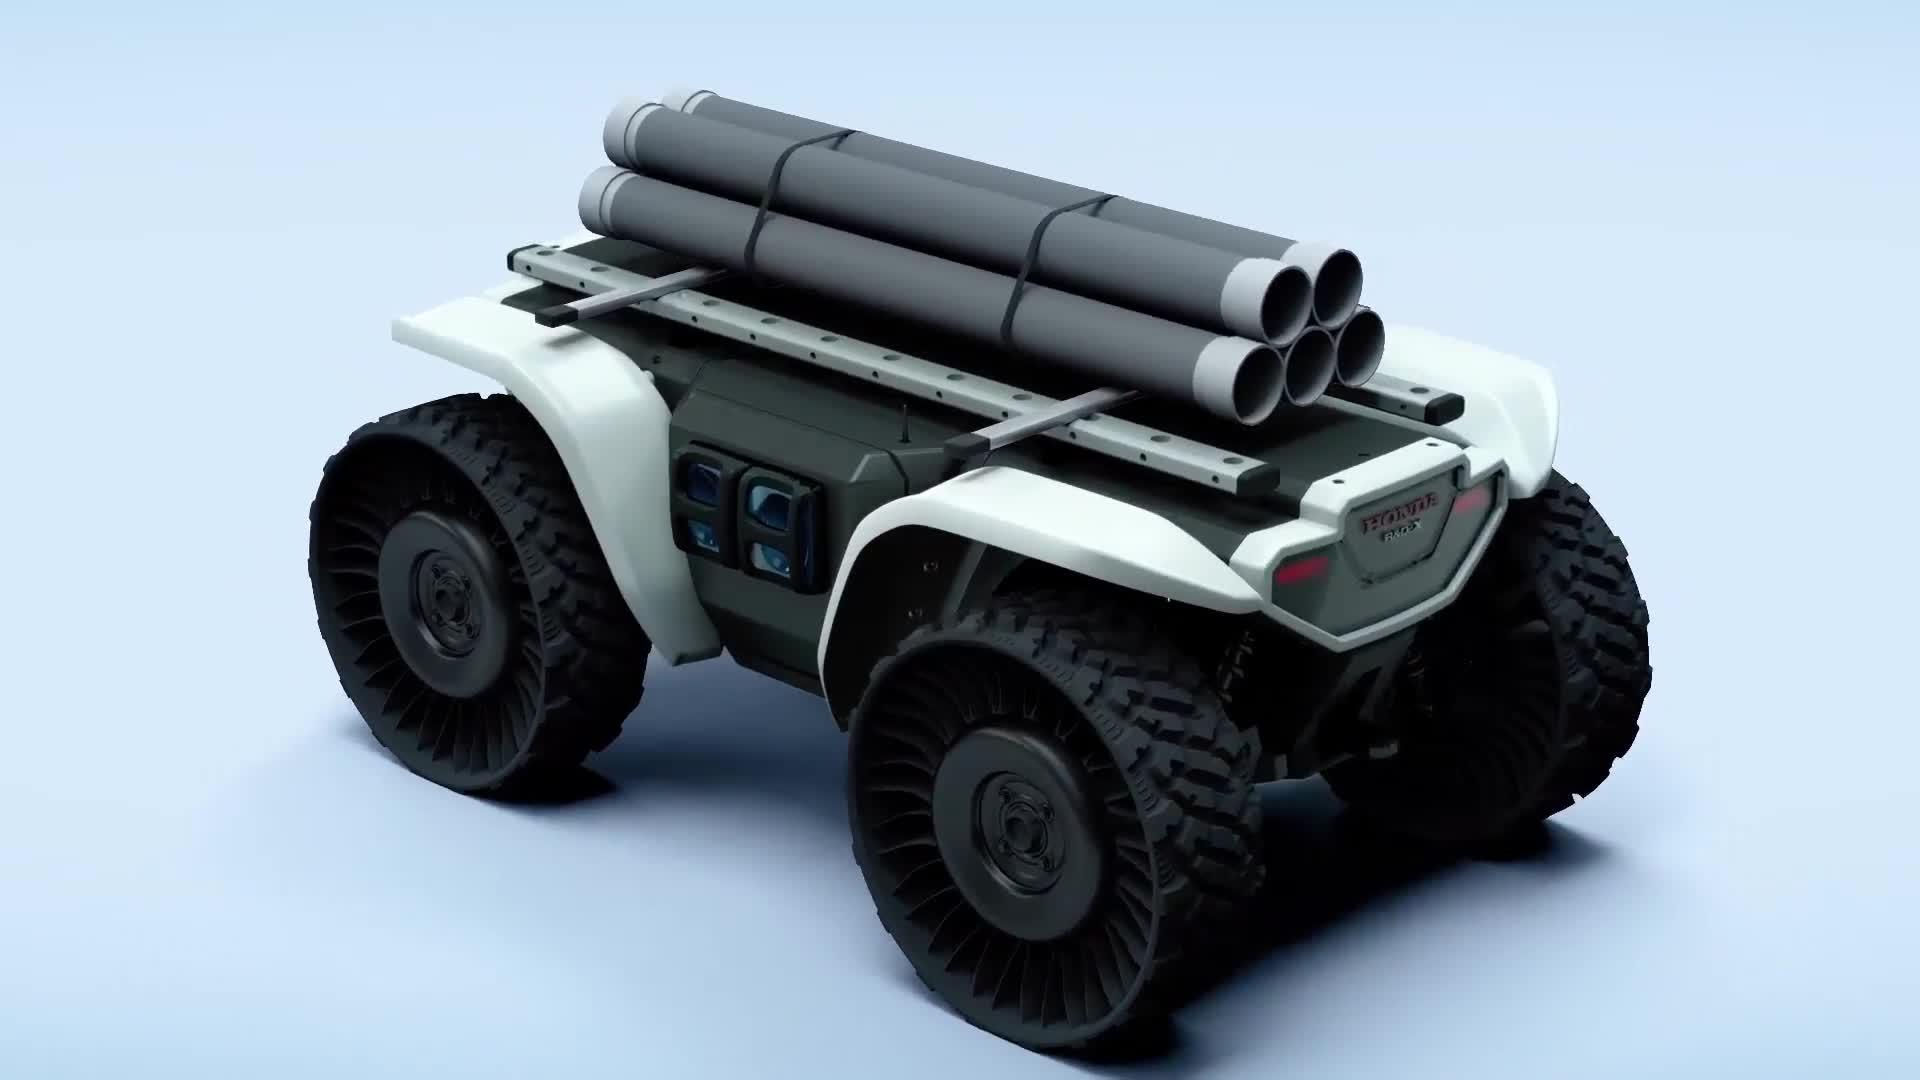 Honda Robots And Mobile Power Packs At Ces 2018 Autoblog Electrical Sources For Smashing Robotics